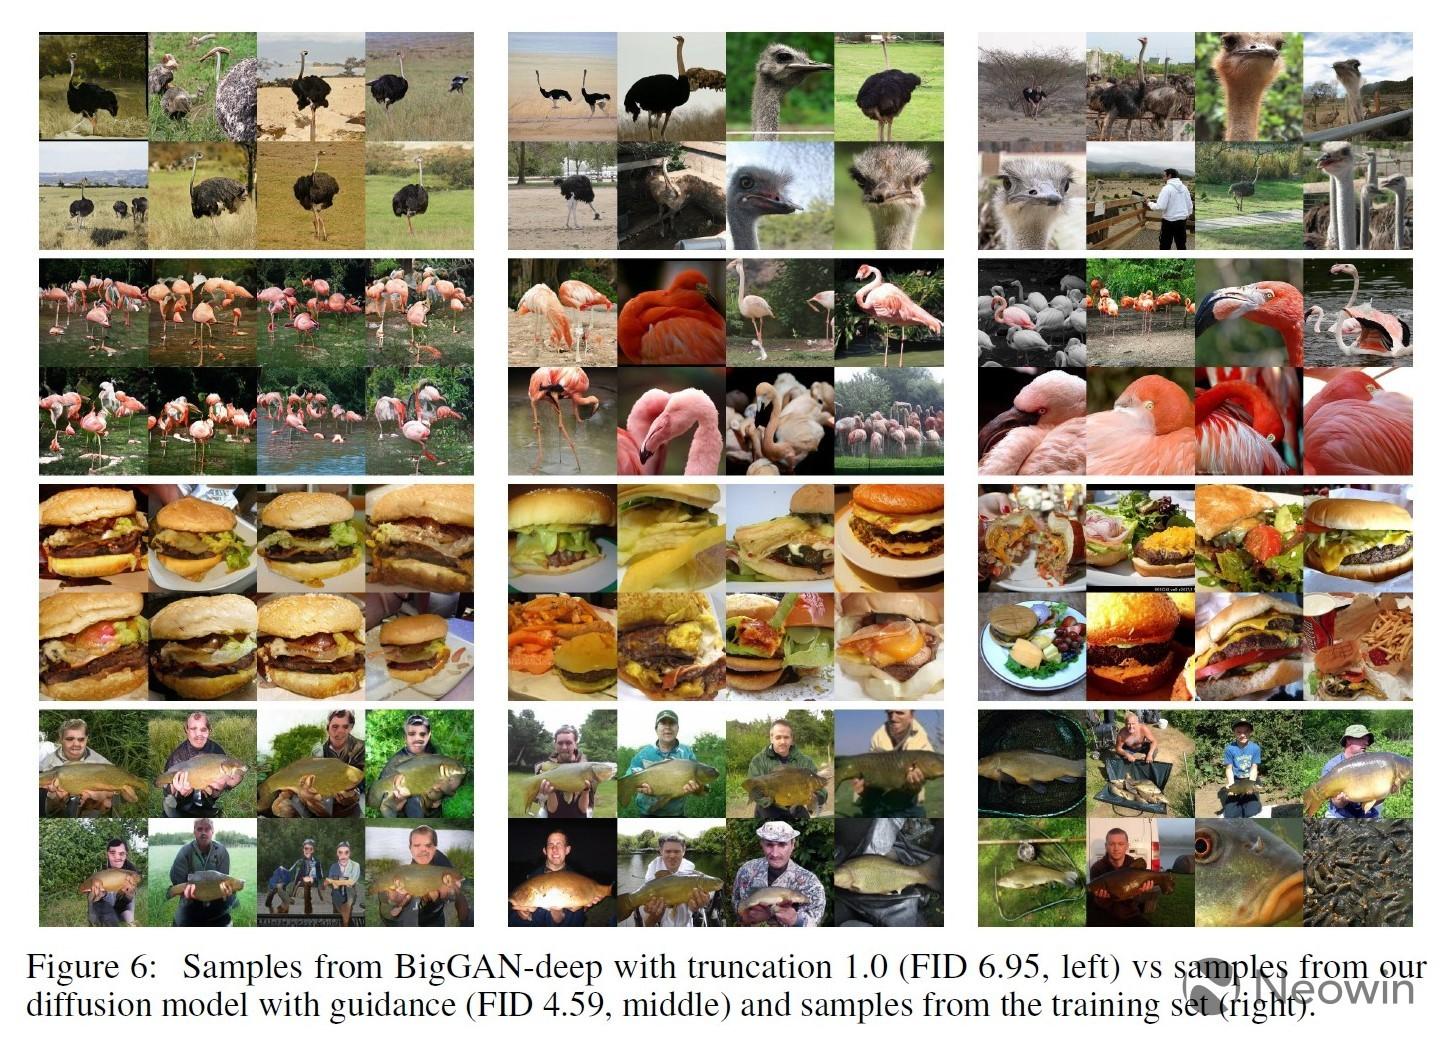 Images from BigGAN-Deep OpenAI&039s Diffusion Models and the training dataset